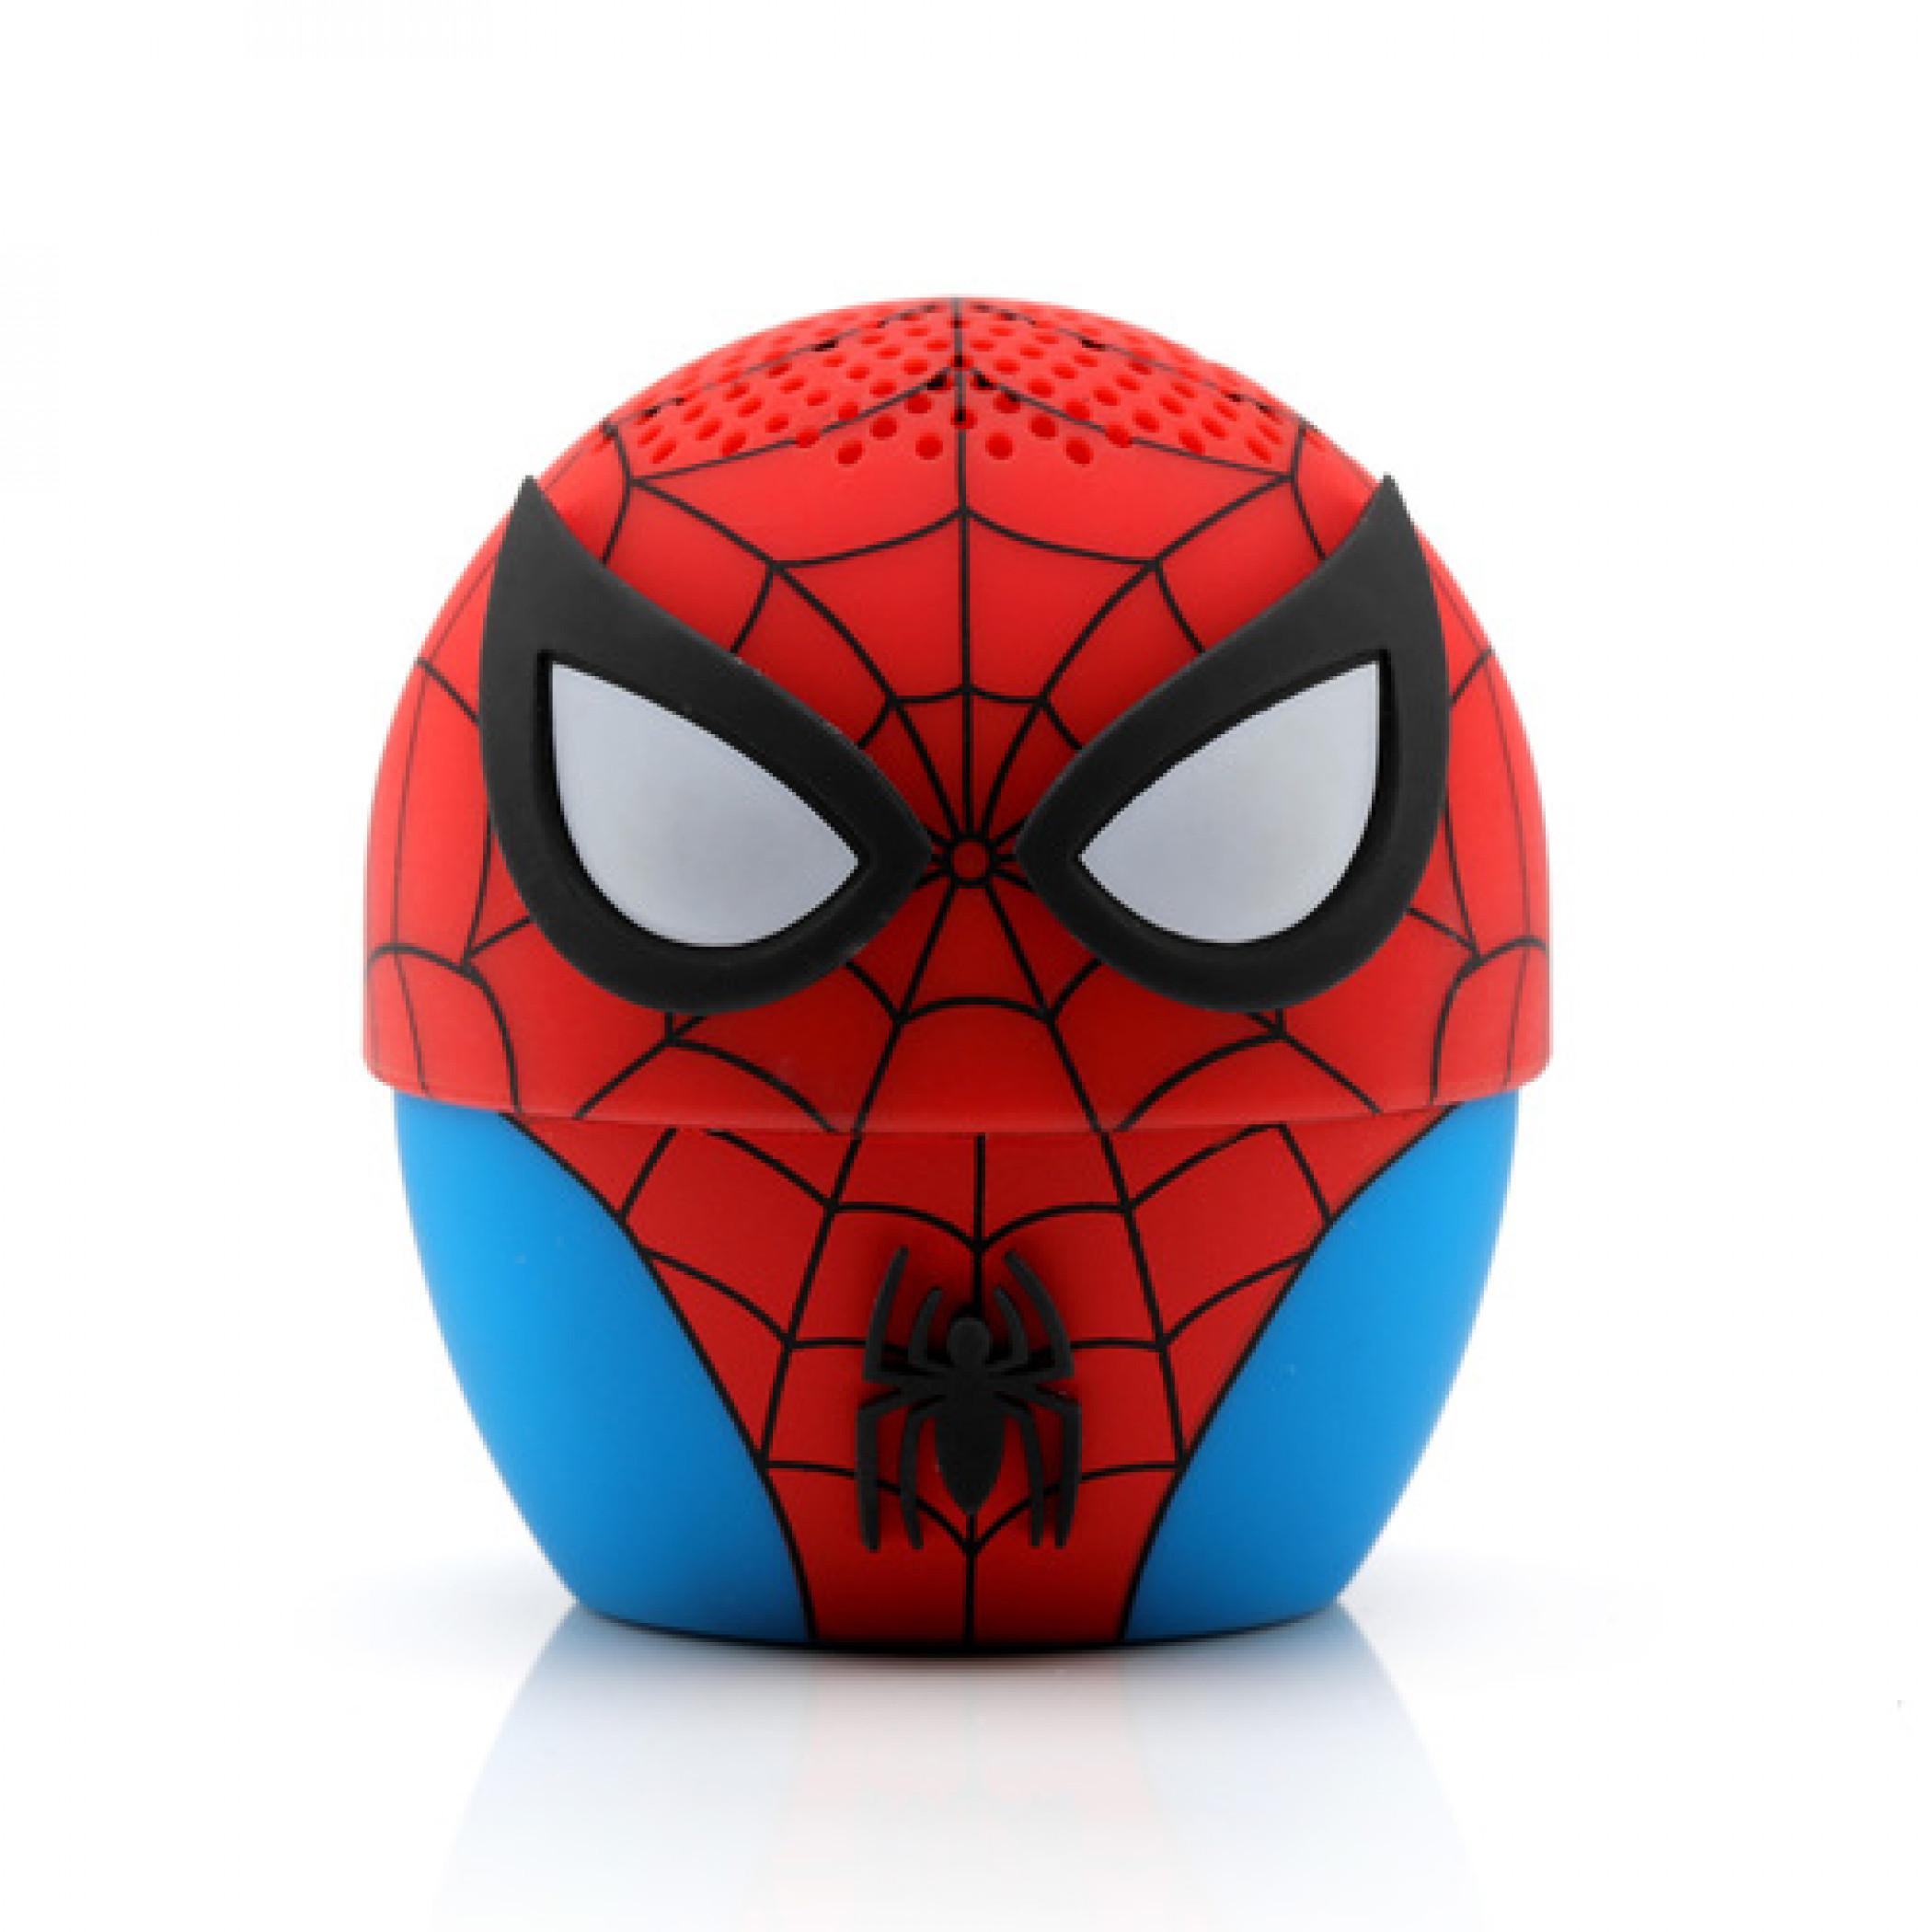 The Amazing Spider-Man Bitty Boomers Bluetooth Speaker